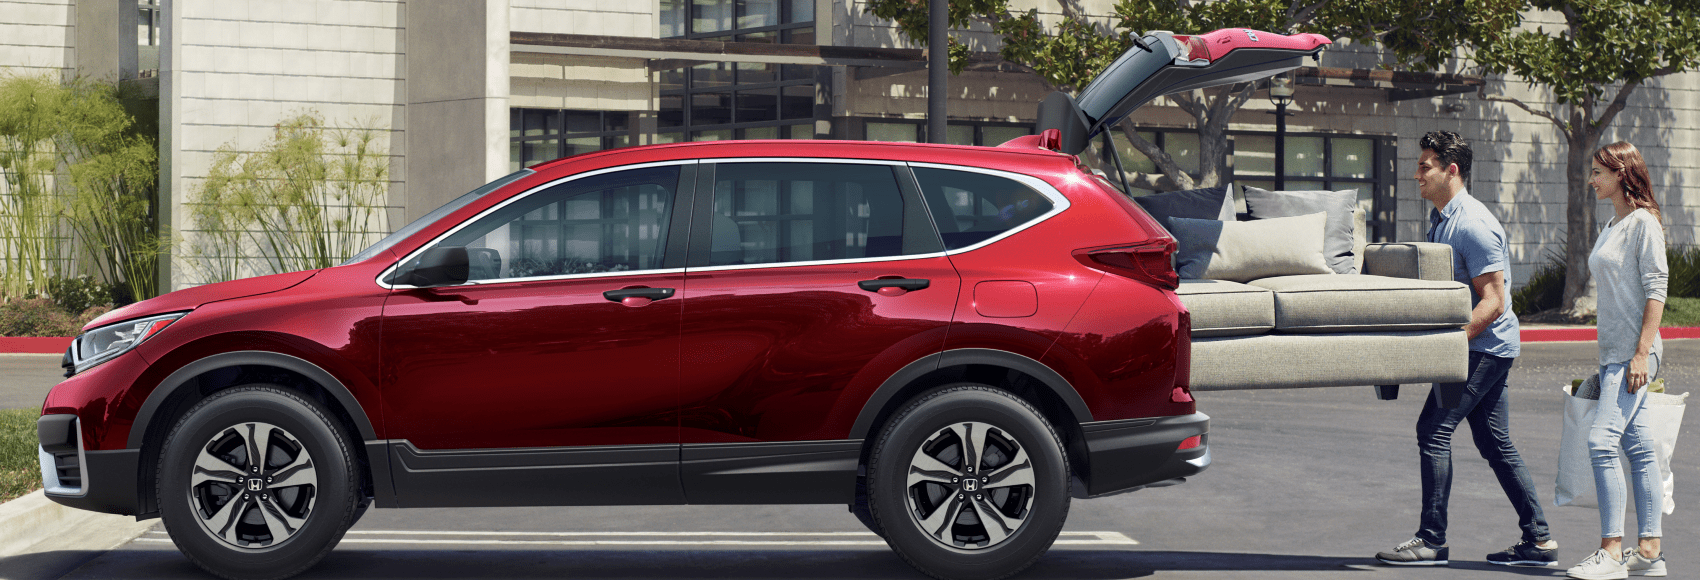 Test Drive The 2021 Honda CR-V Today!